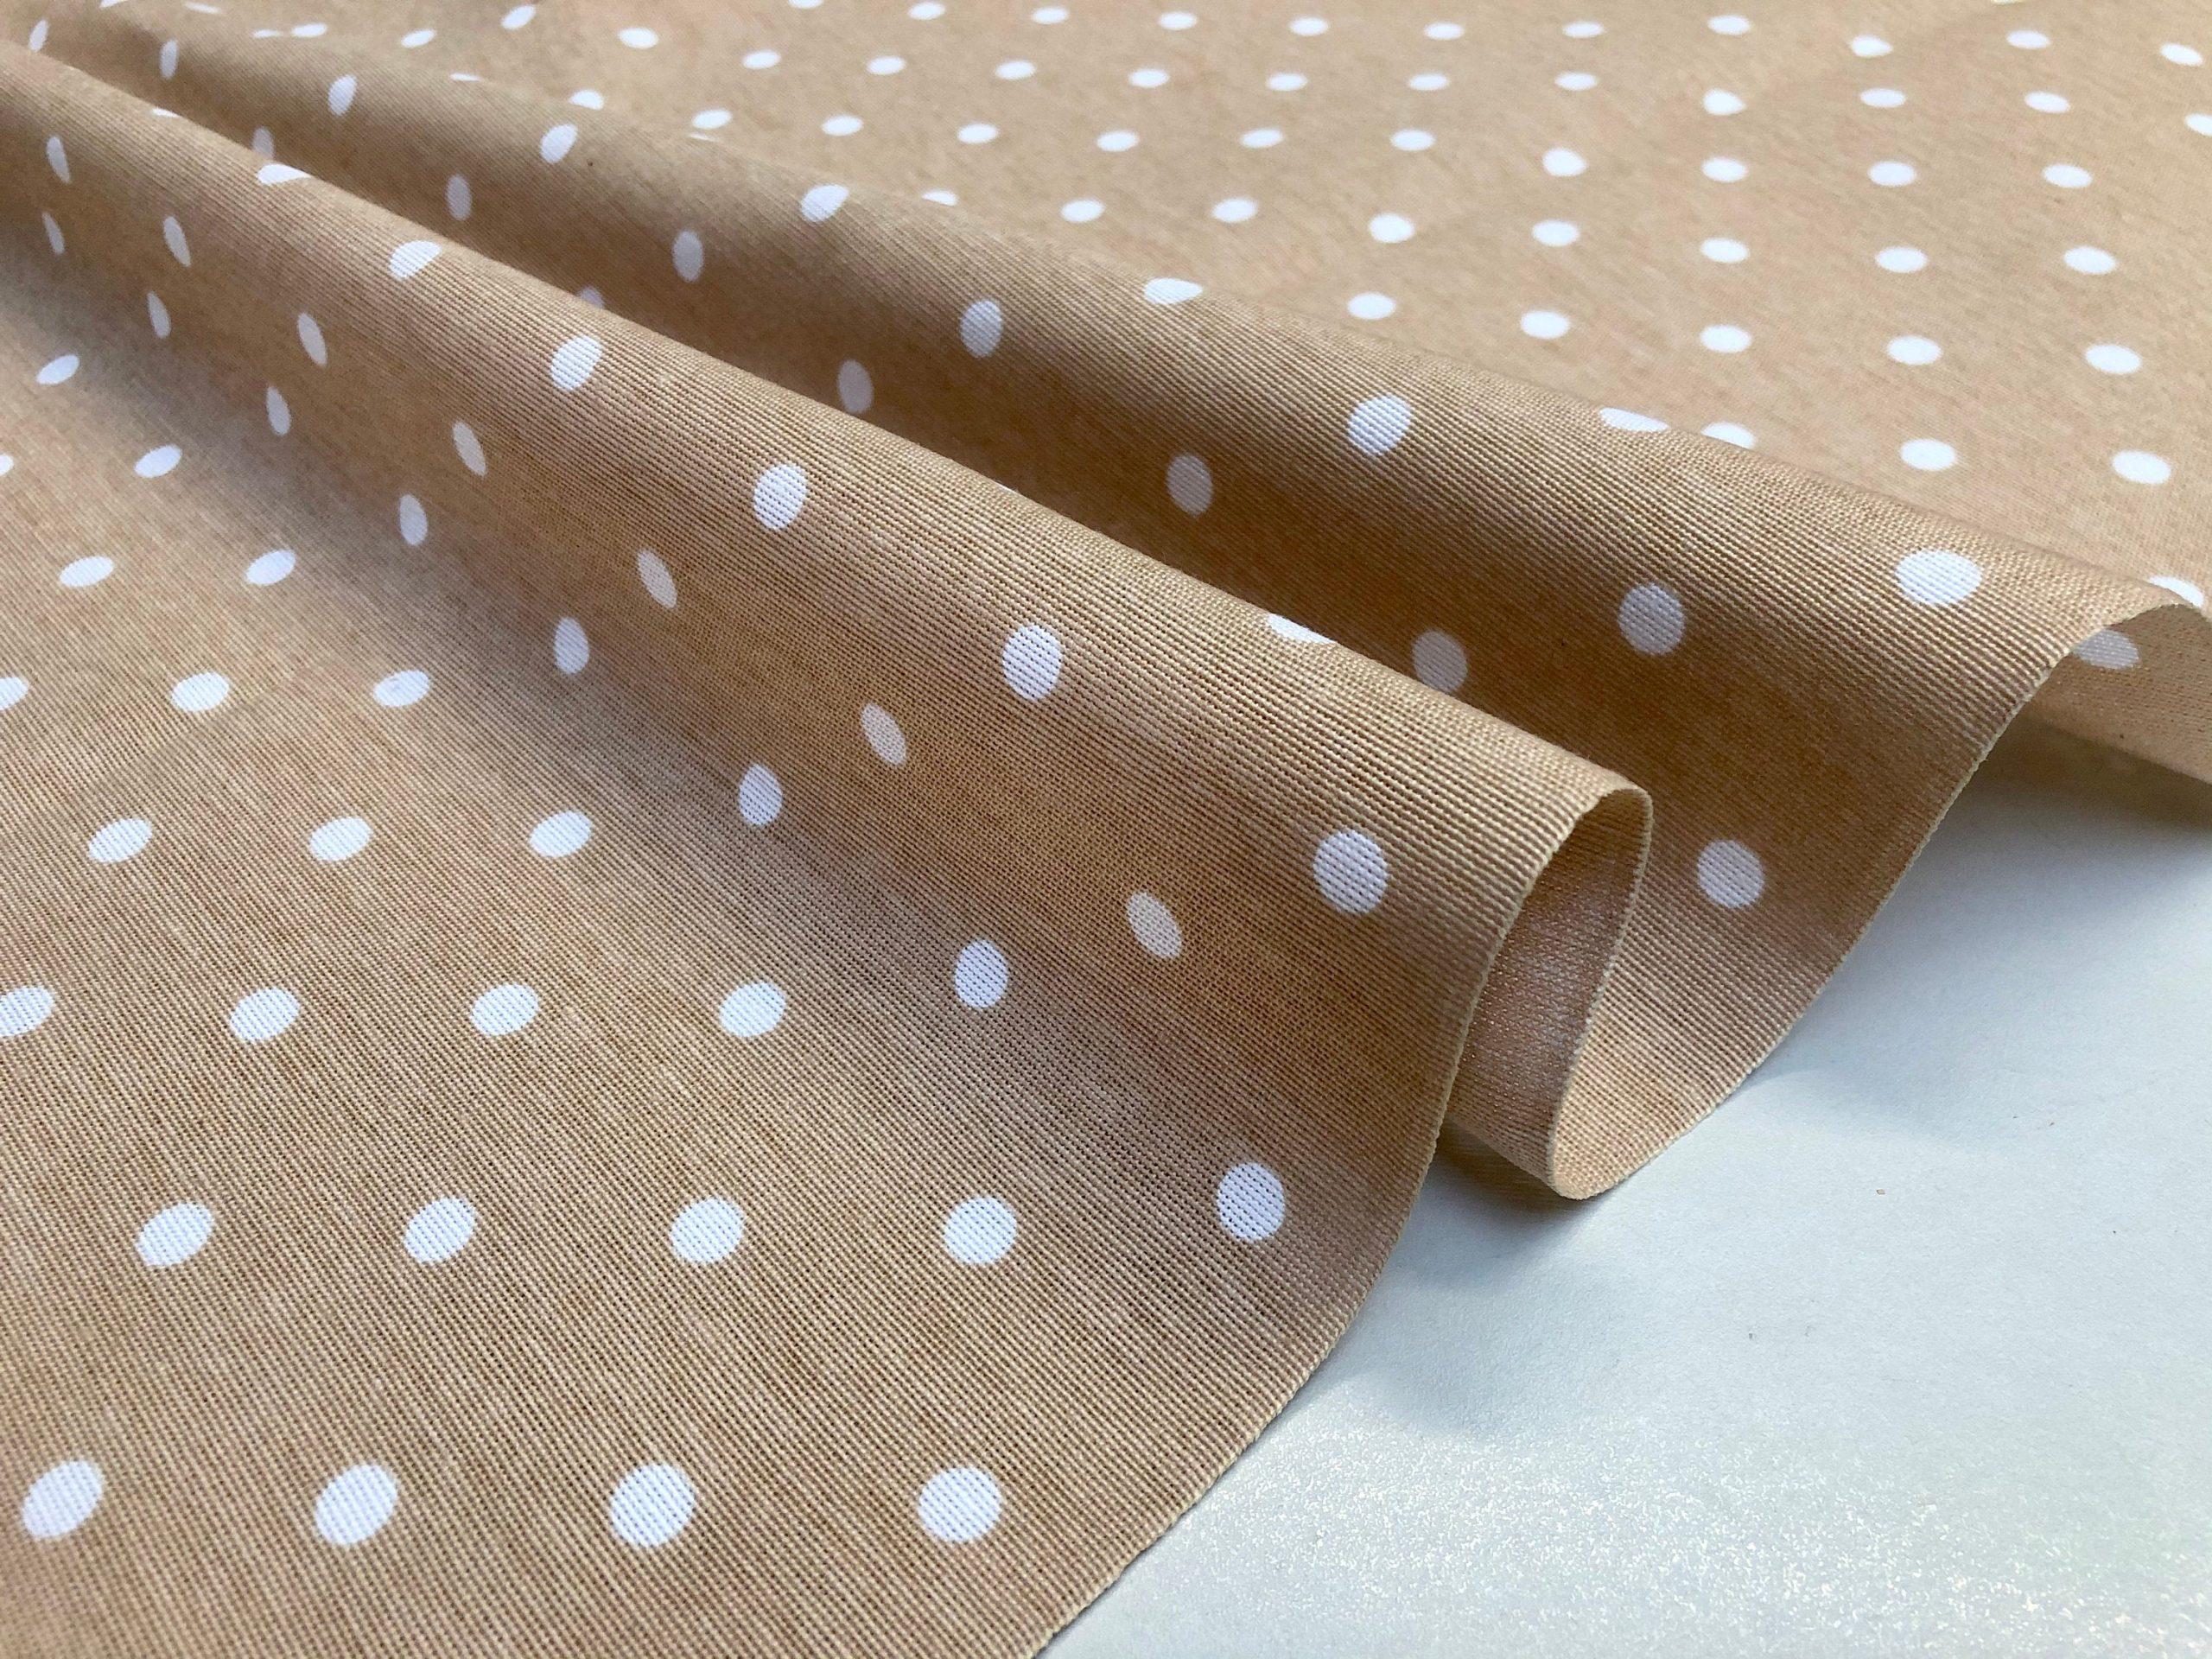 BEIGE Polka Dot Fabric White Spots Dots PolyCotton Material Classic Chic Textile Home Decor Dress Curtains – 55''/140cm Wide Canvas